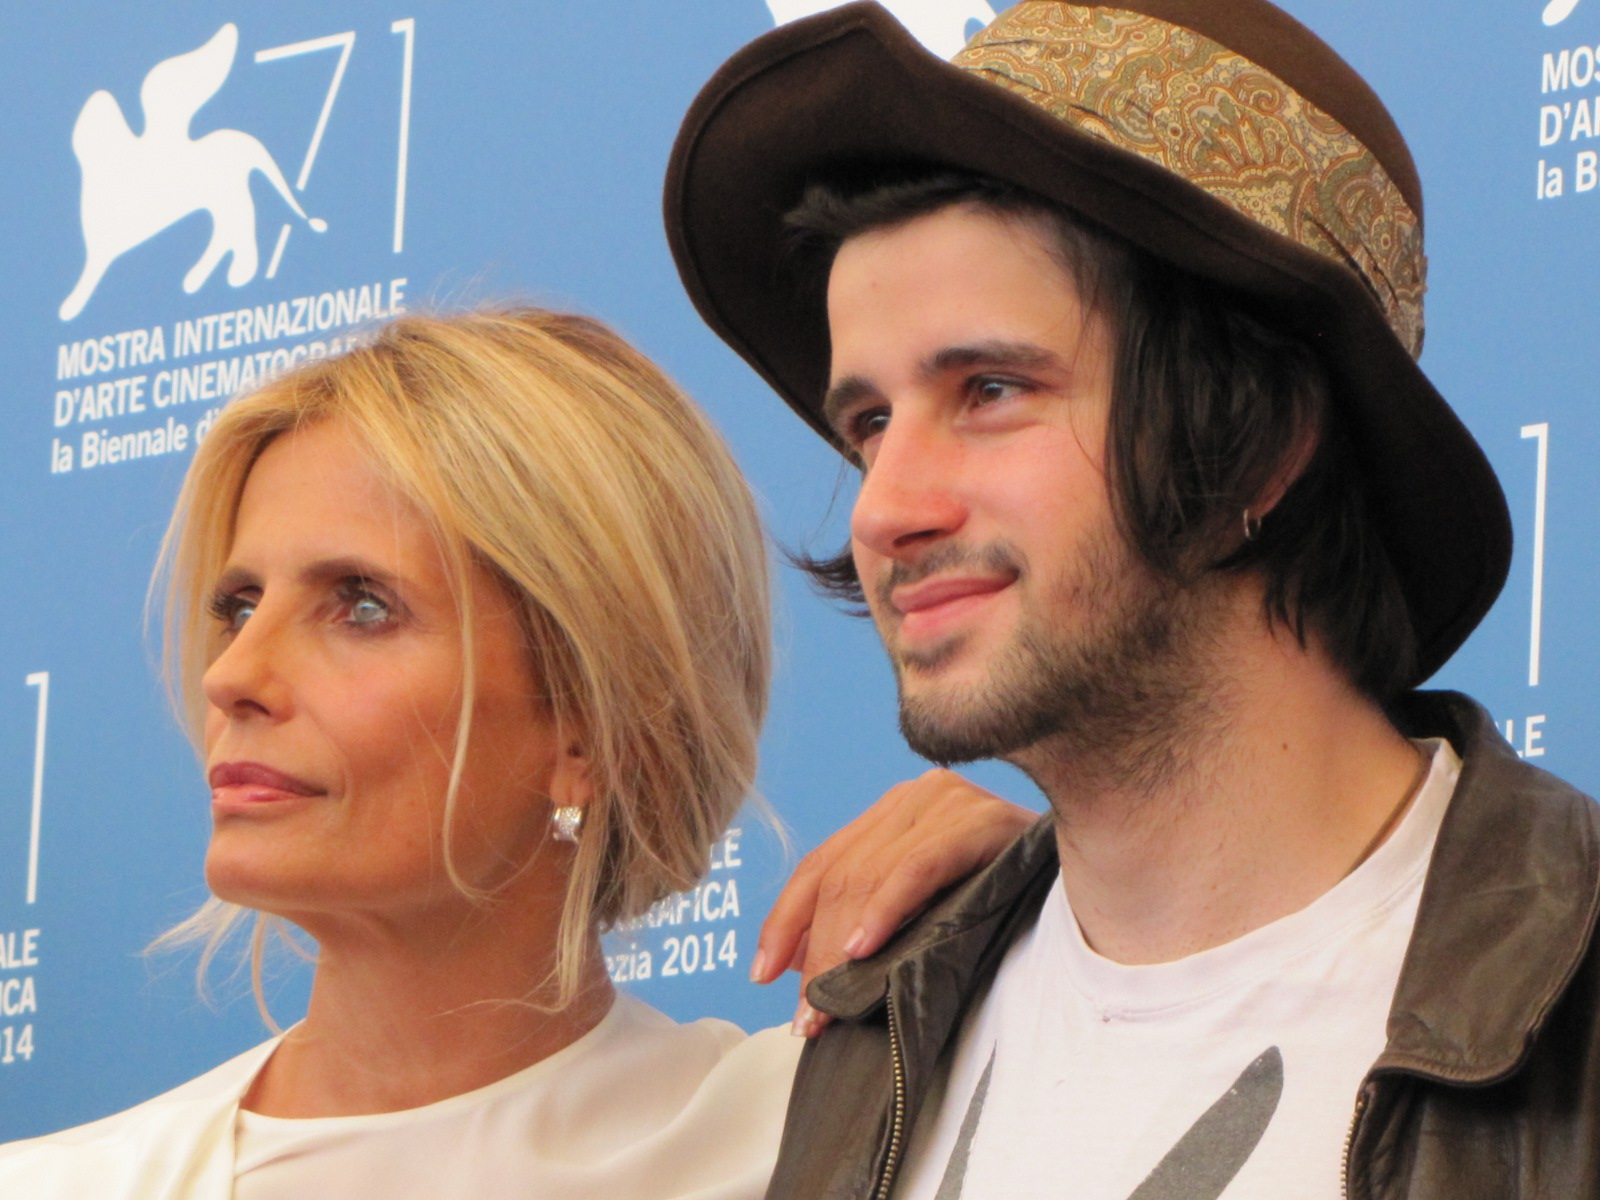 La vita oscena a Venezia 2014, Clement Metayer con lsabella Ferrari